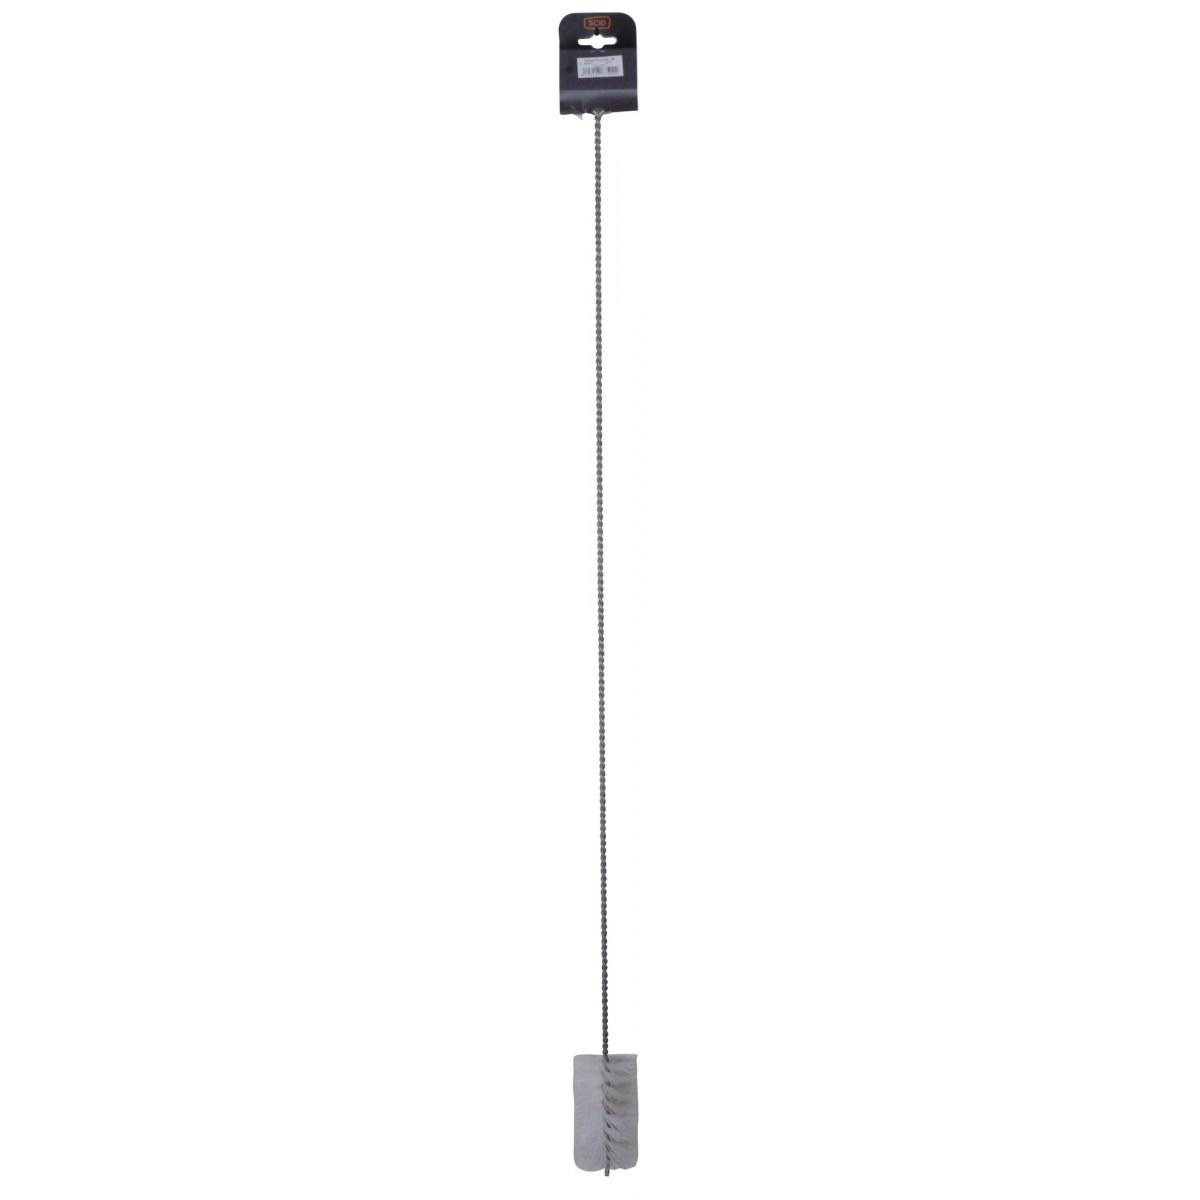 Goupillon nylon SCID - Diamètre 60 mm